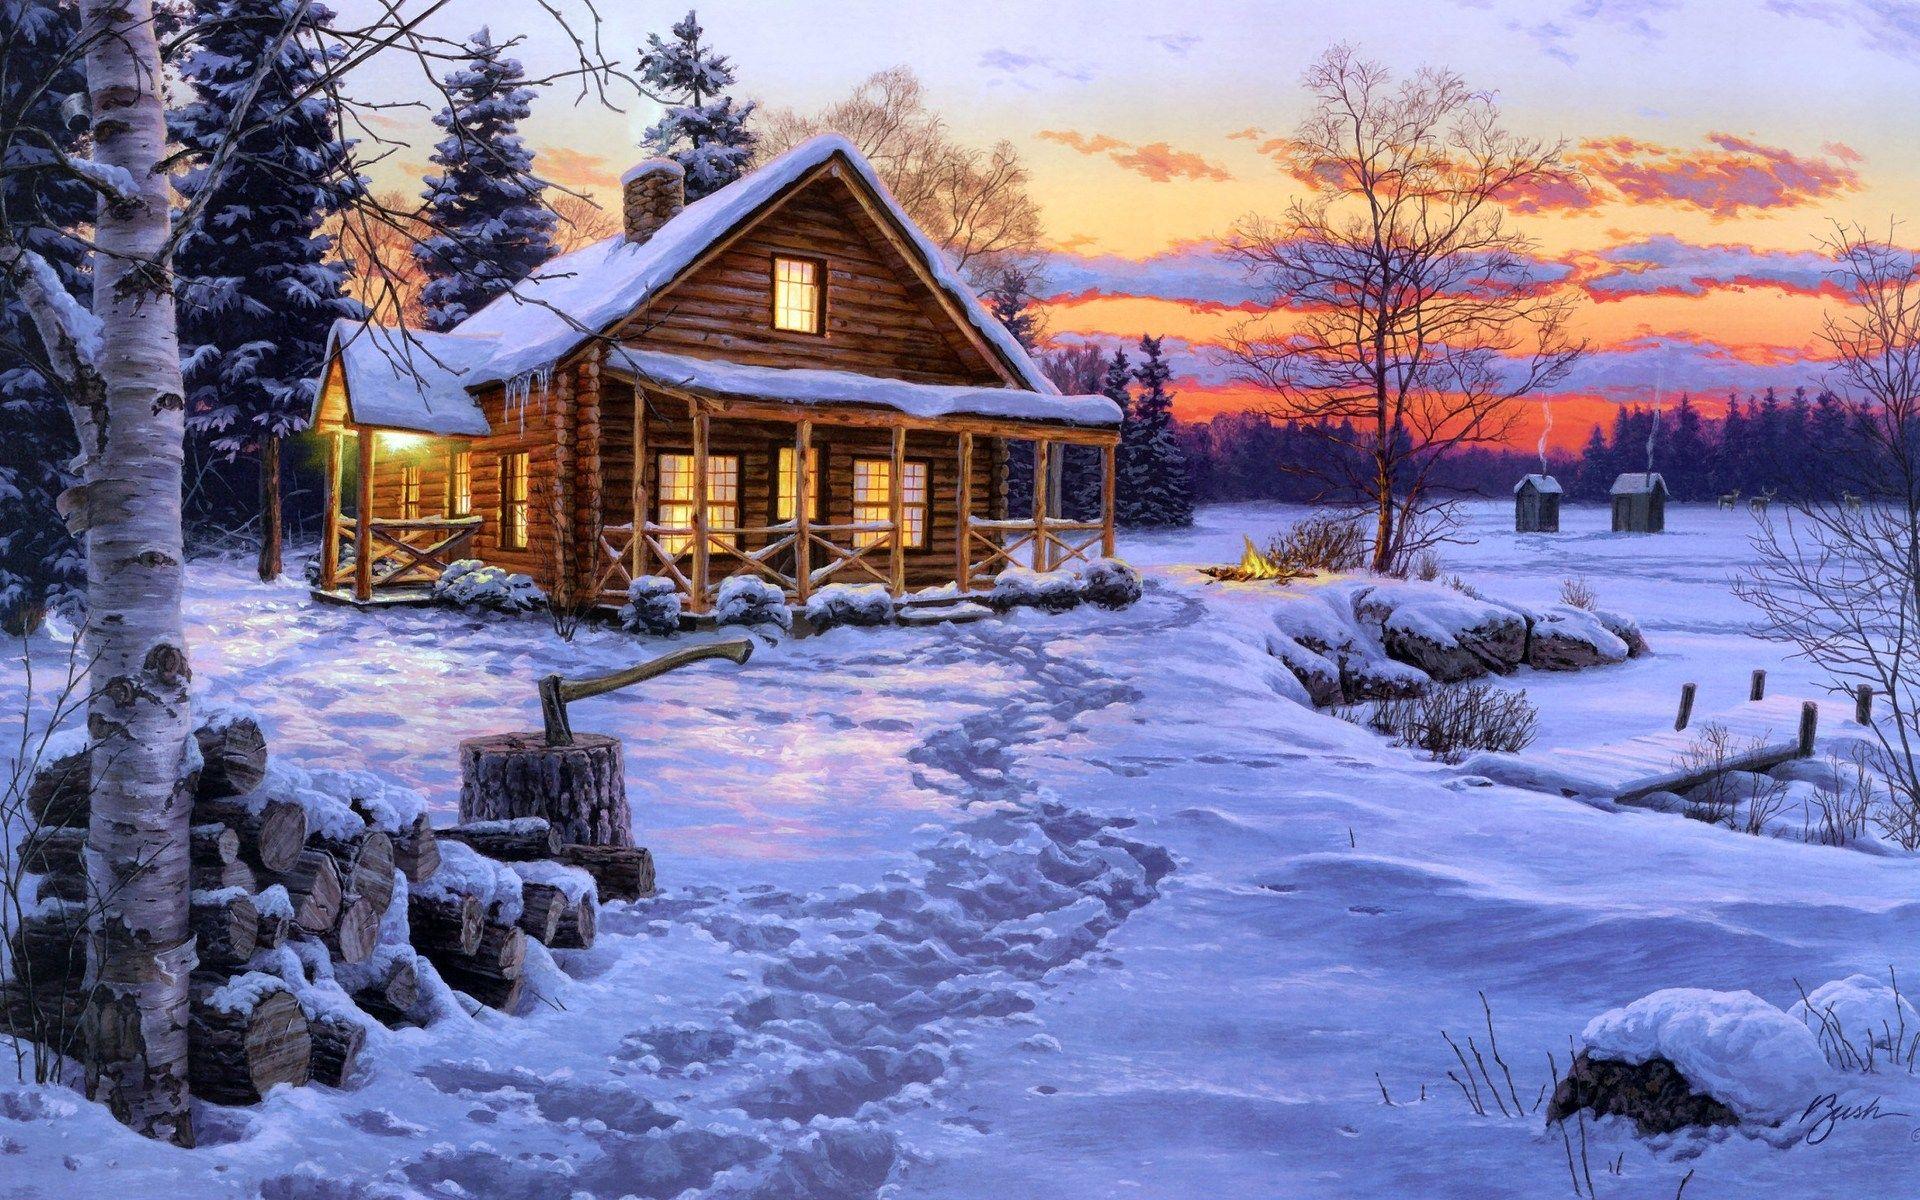 old cabin winter scene wallpaper - photo #6